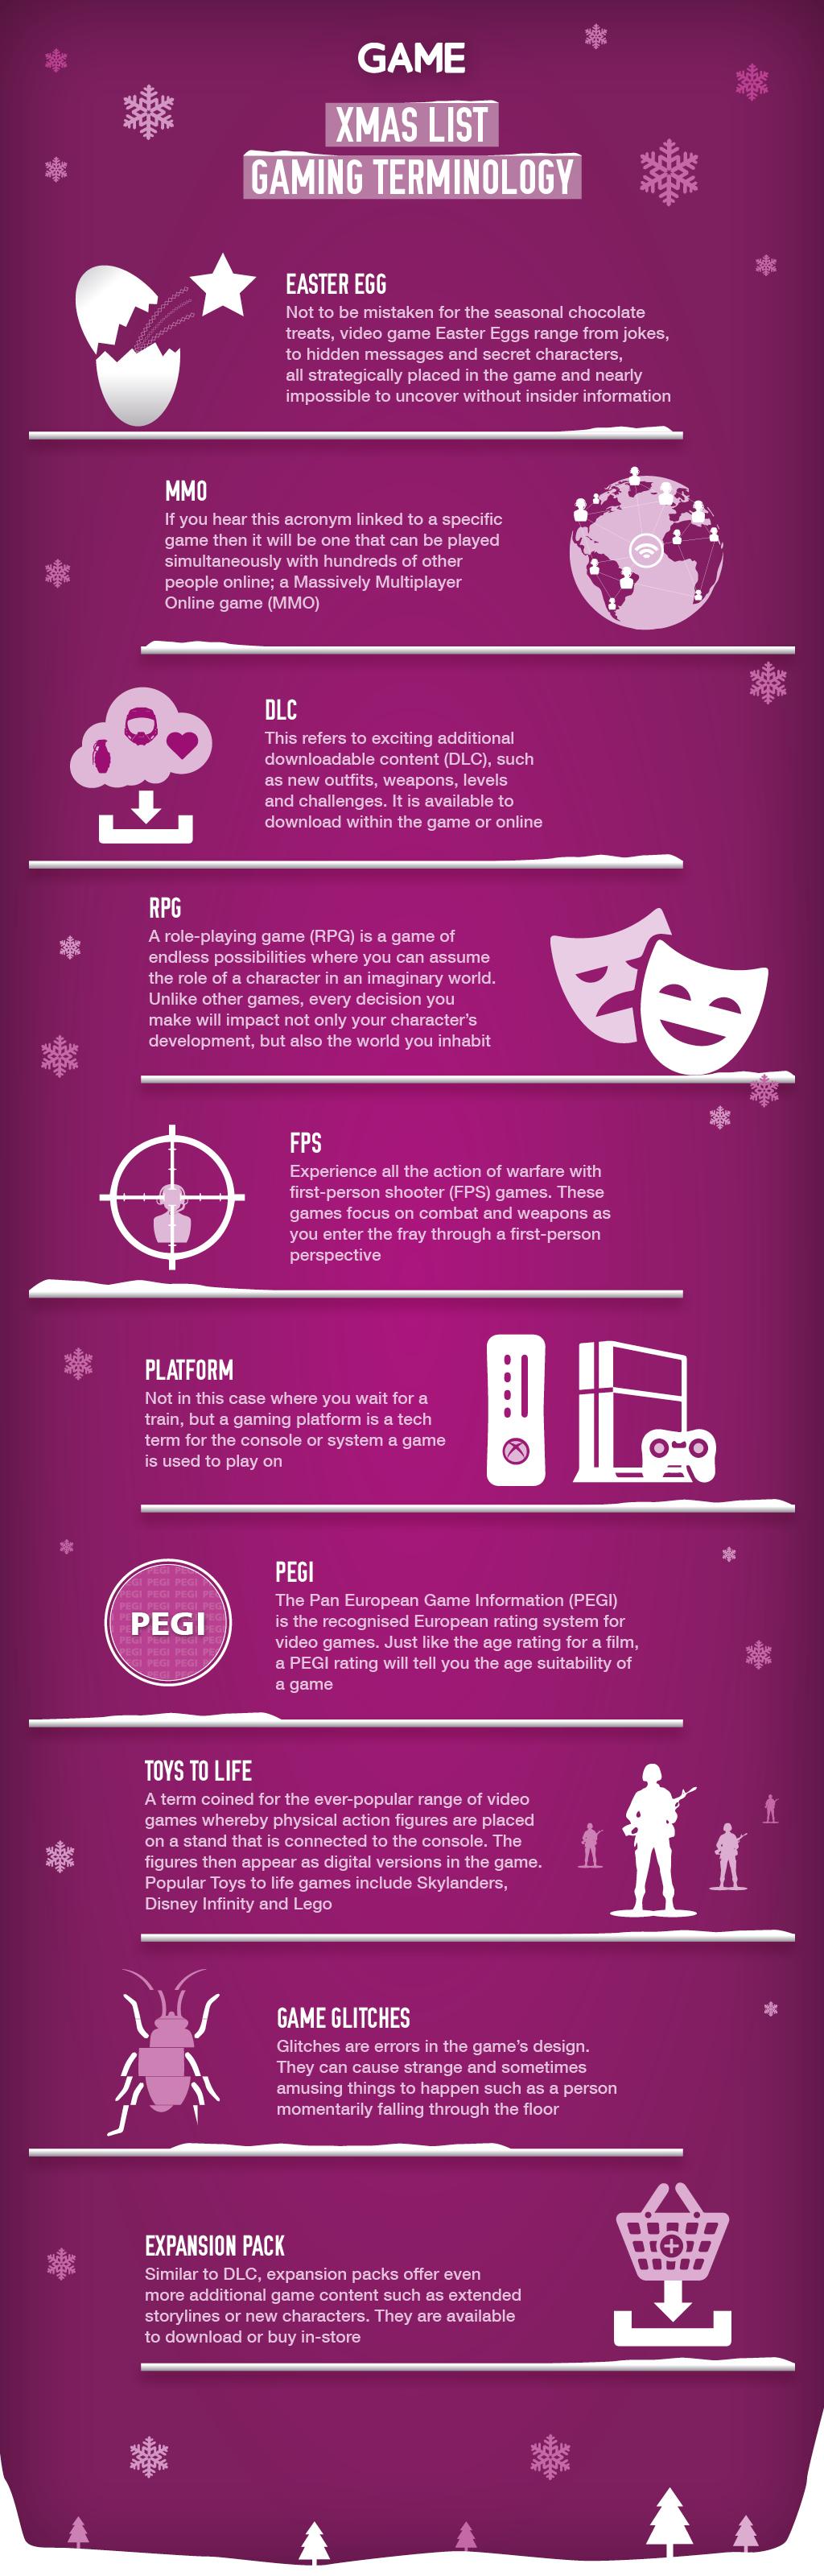 Game xmas list - gaming terminology[1]